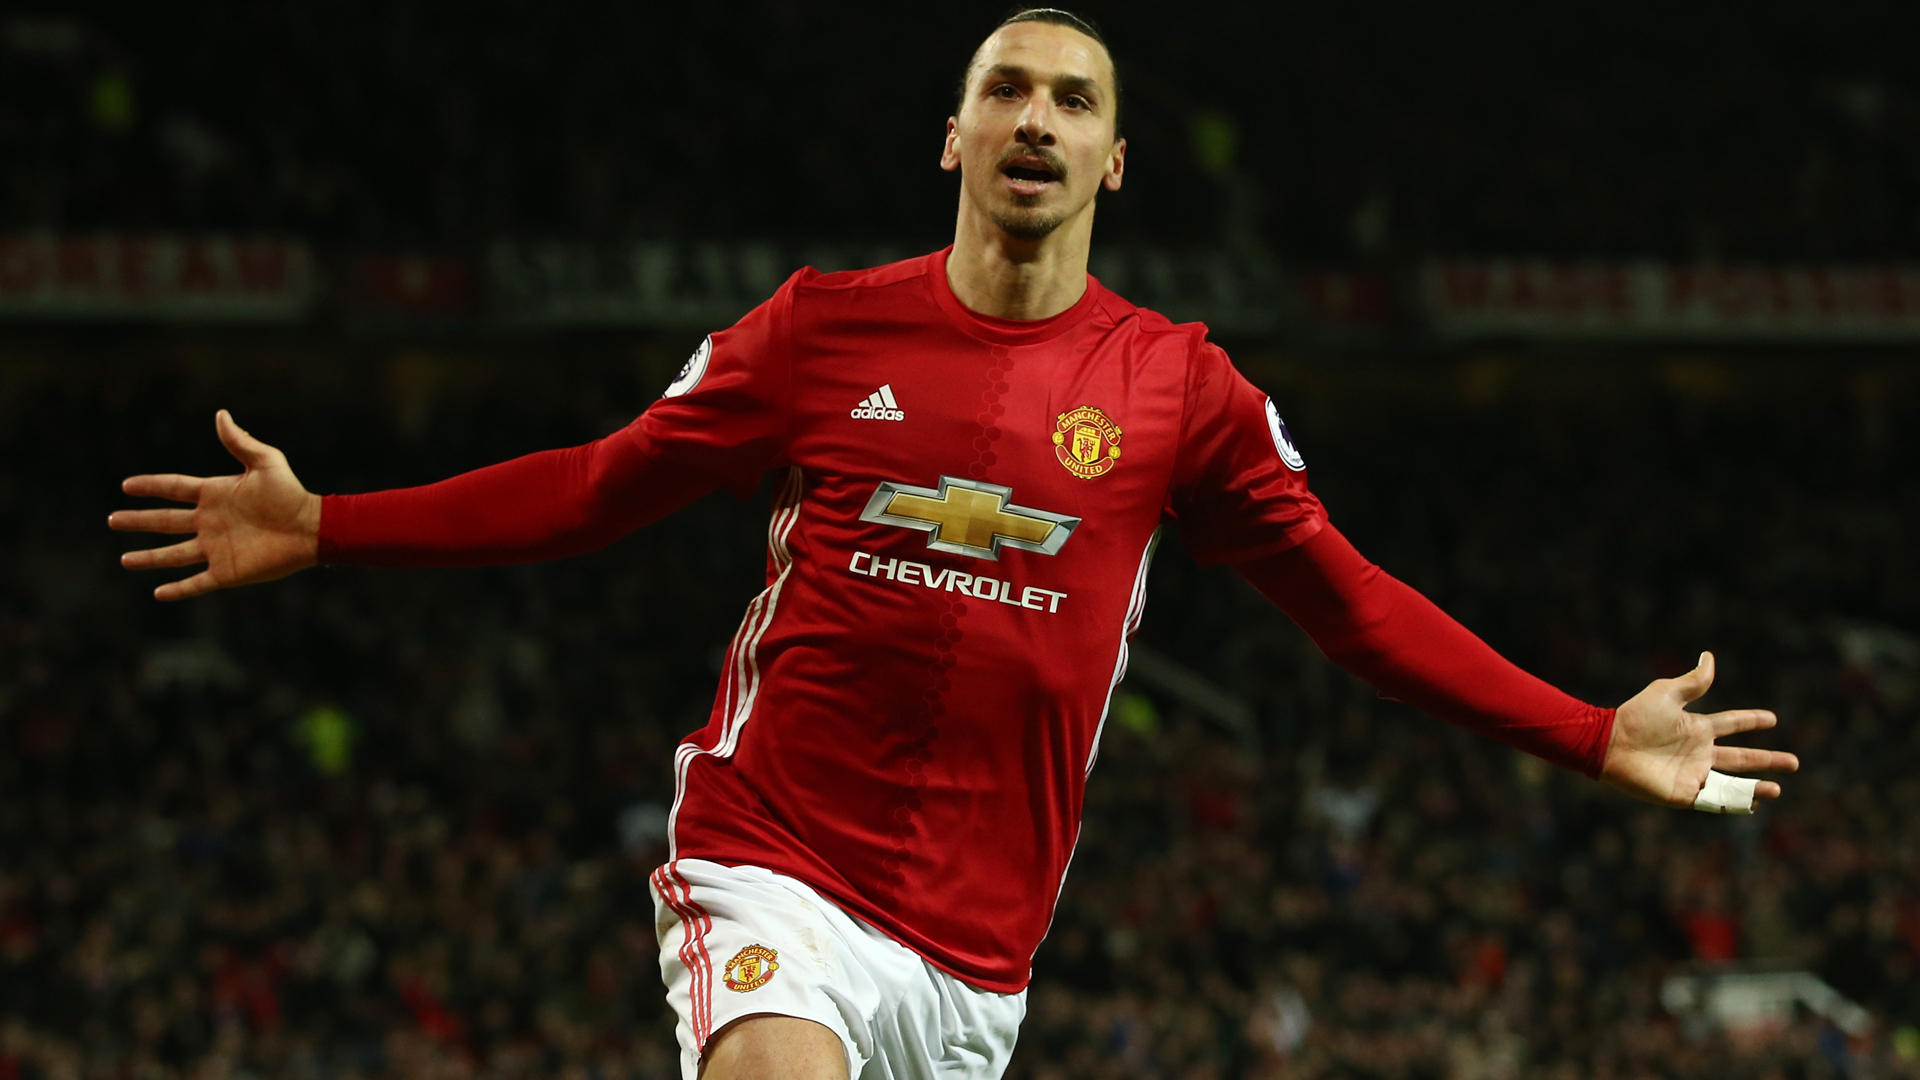 Rumour Has It: Ibrahimovic to make shock Manchester United return